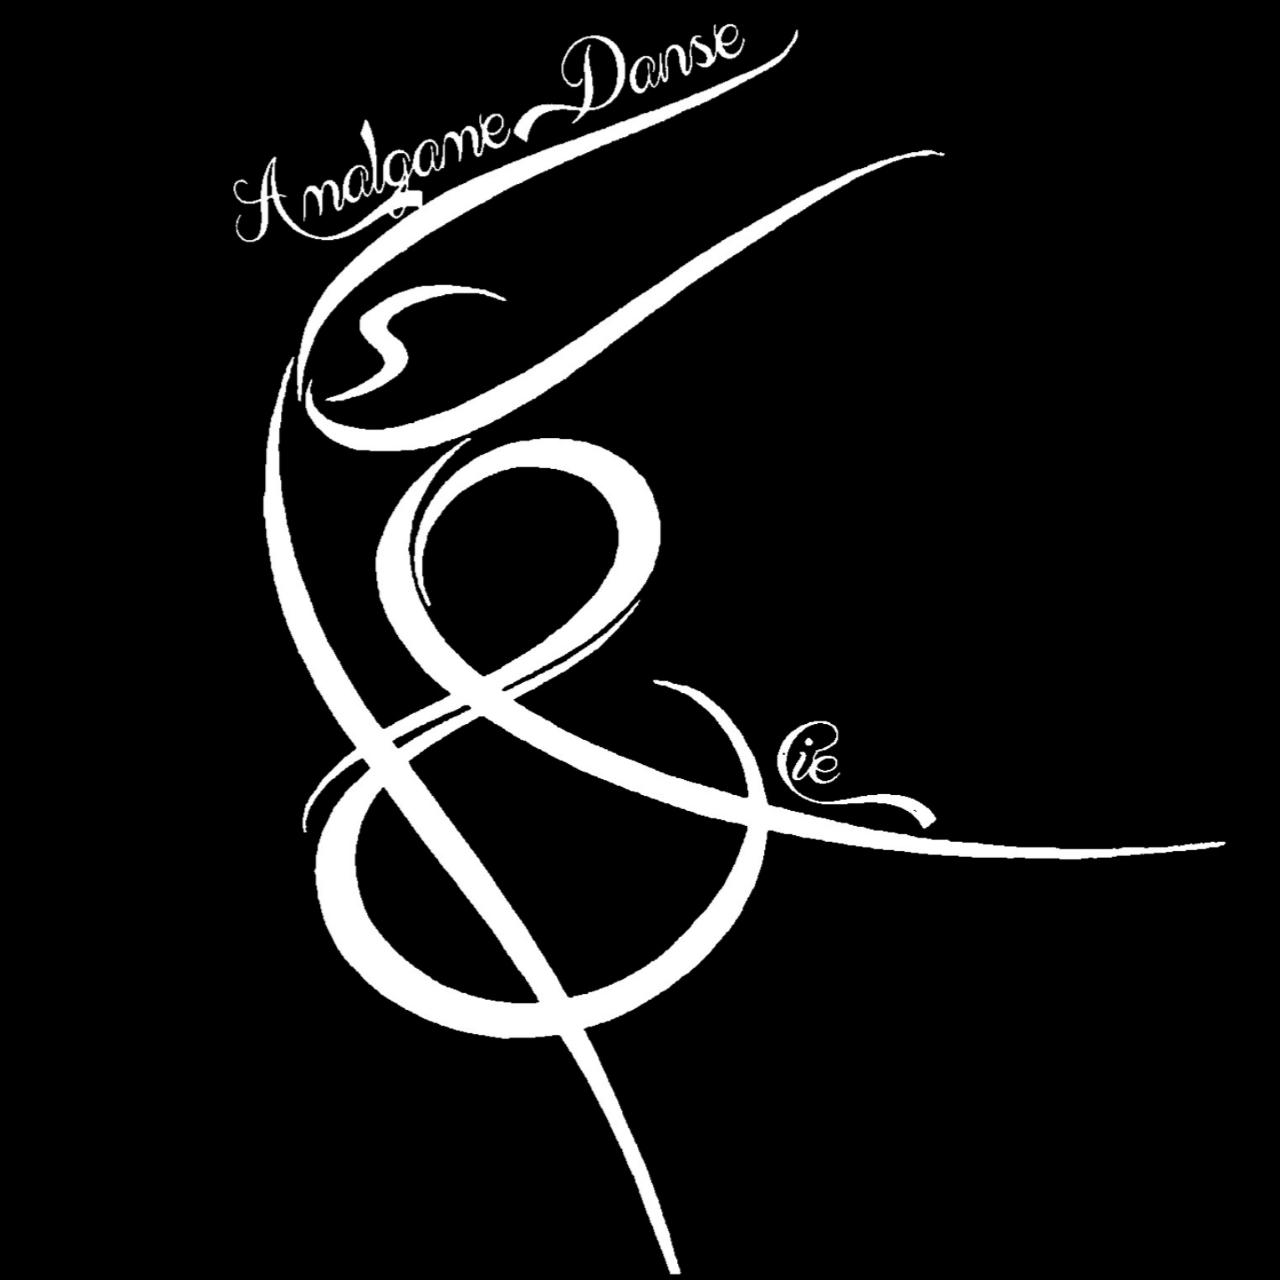 Amalgame Danse et Cie